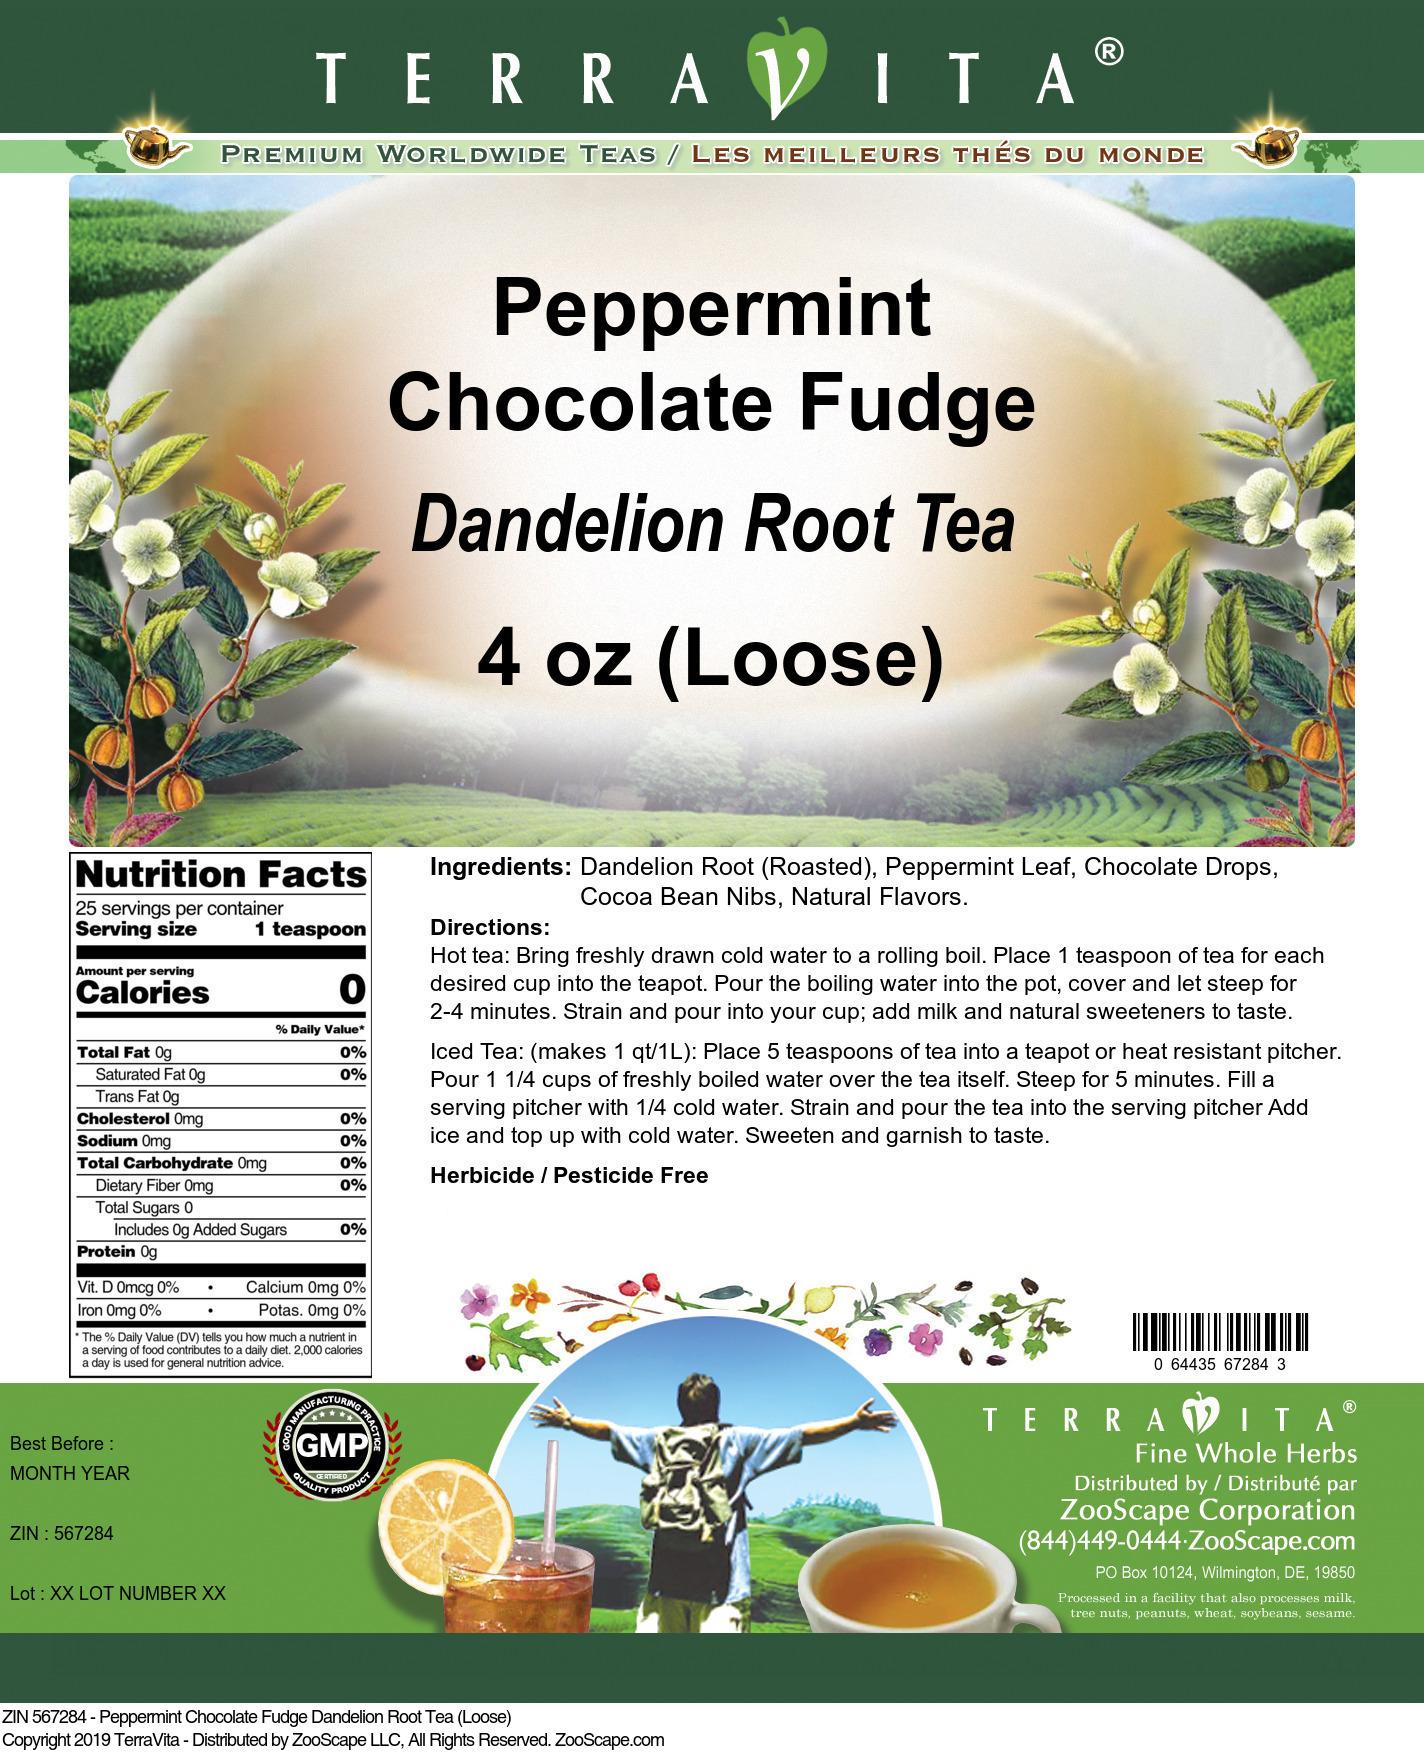 Peppermint Chocolate Fudge Dandelion Root